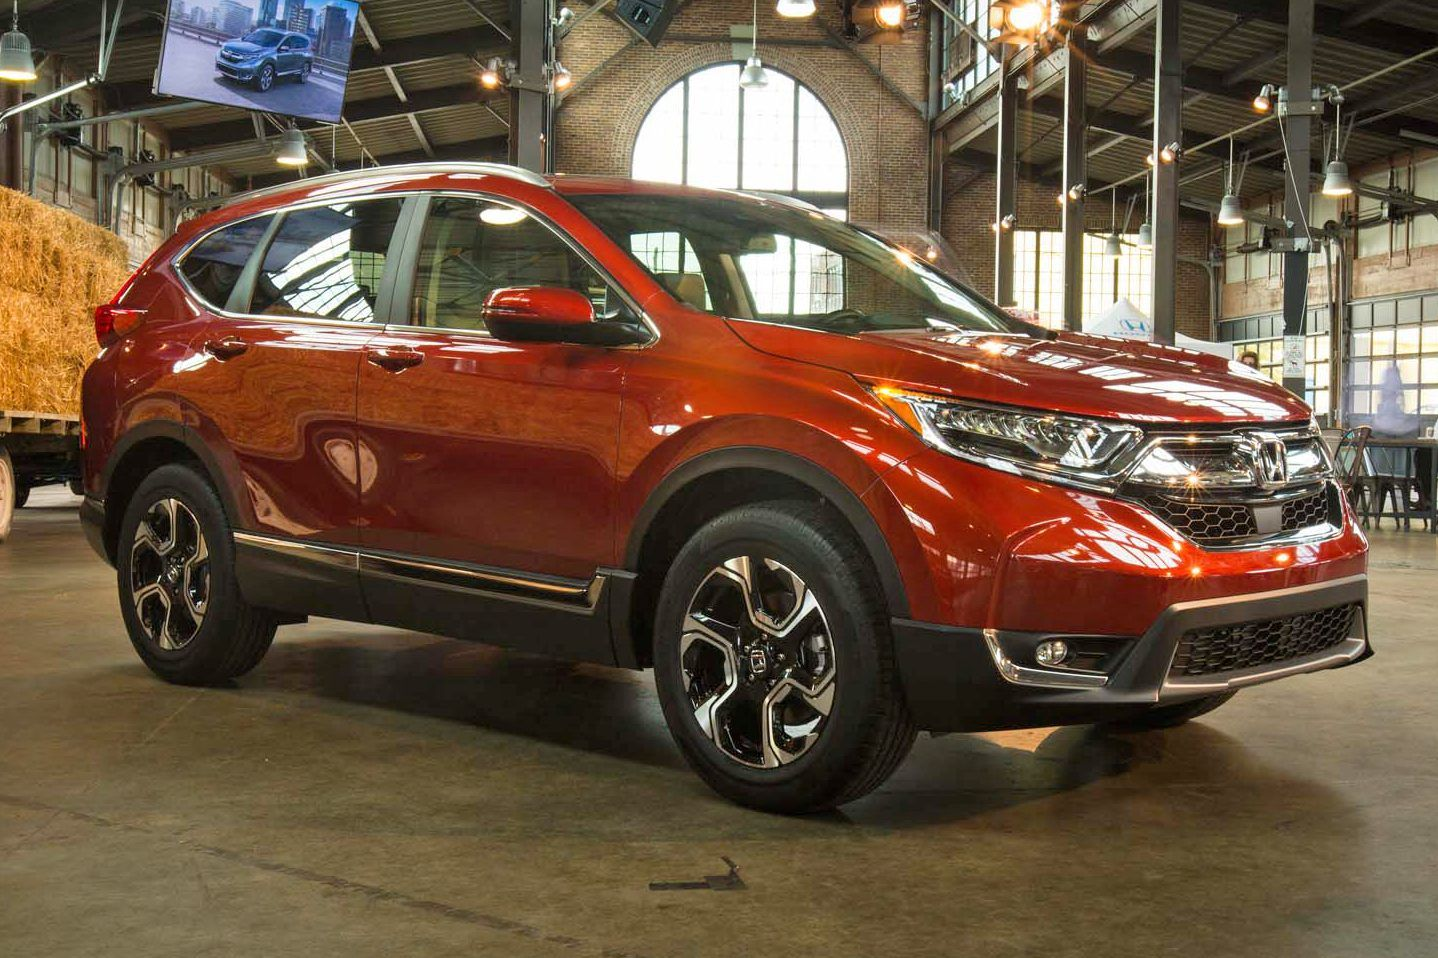 2017 Honda CRV First Look New Underpinnings, First Turbo